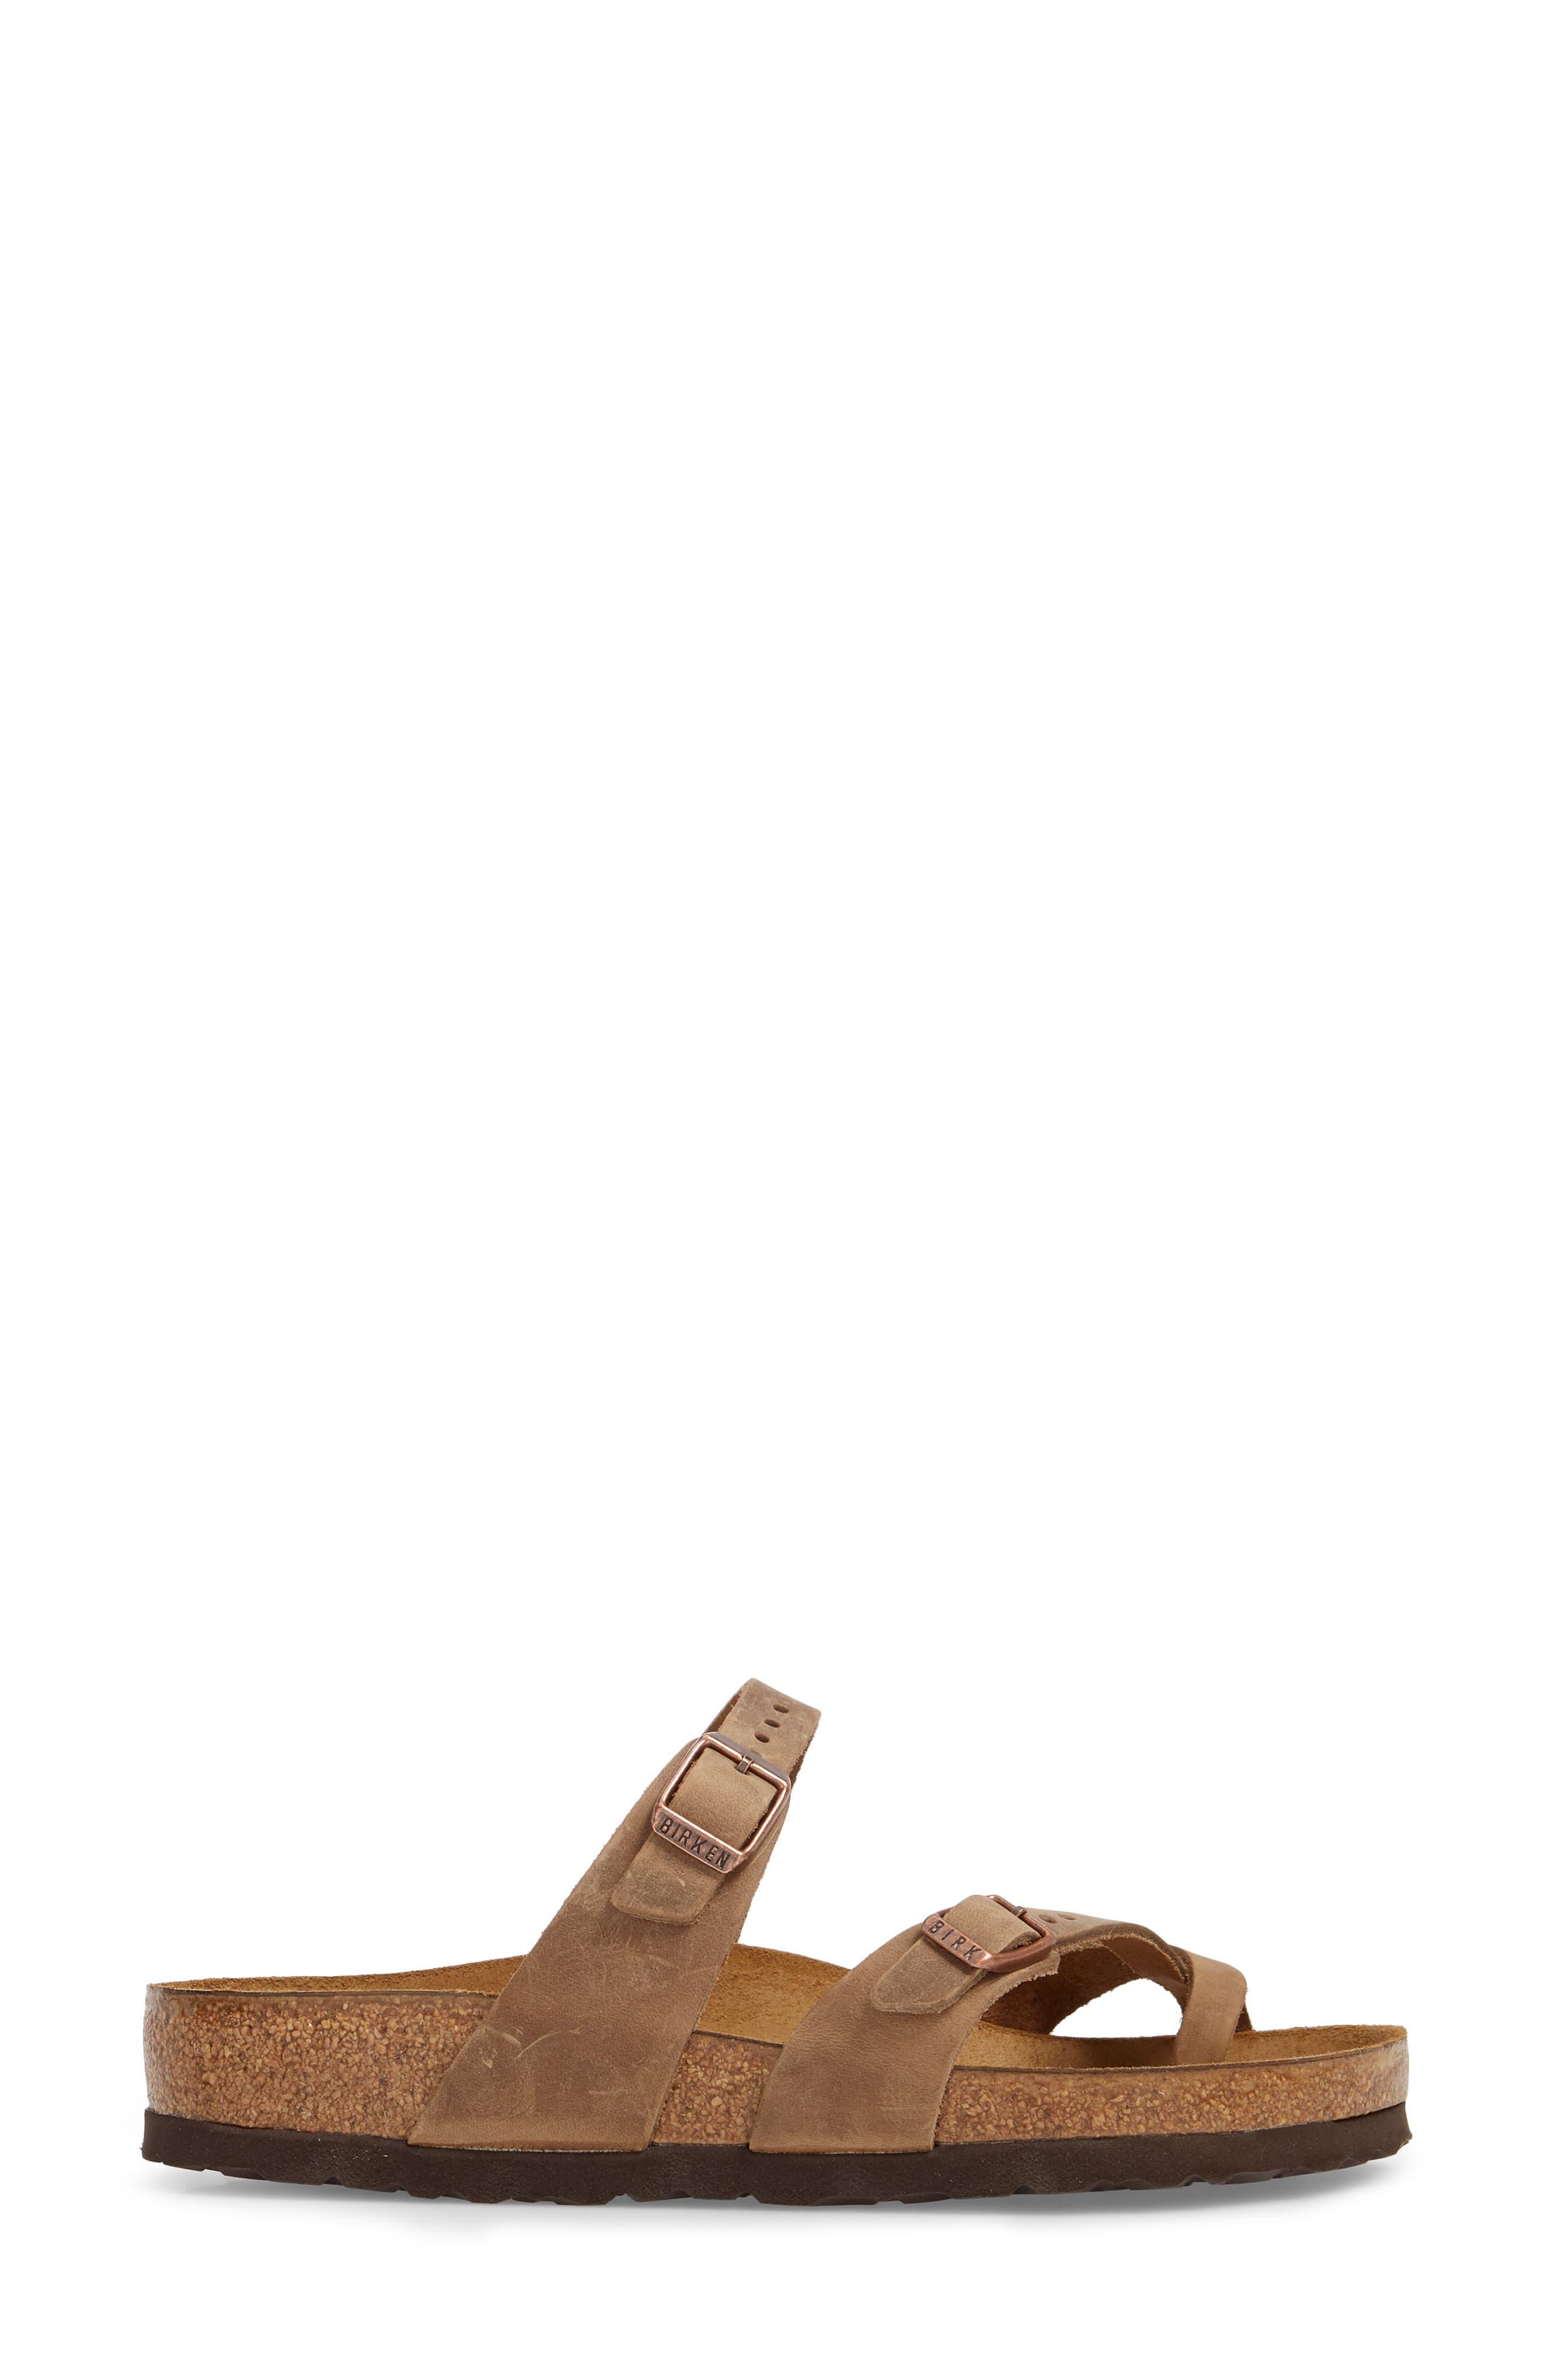 Mayari Slide Sandal,                             Alternate thumbnail 3, color,                             Tobacco Oiled Leather